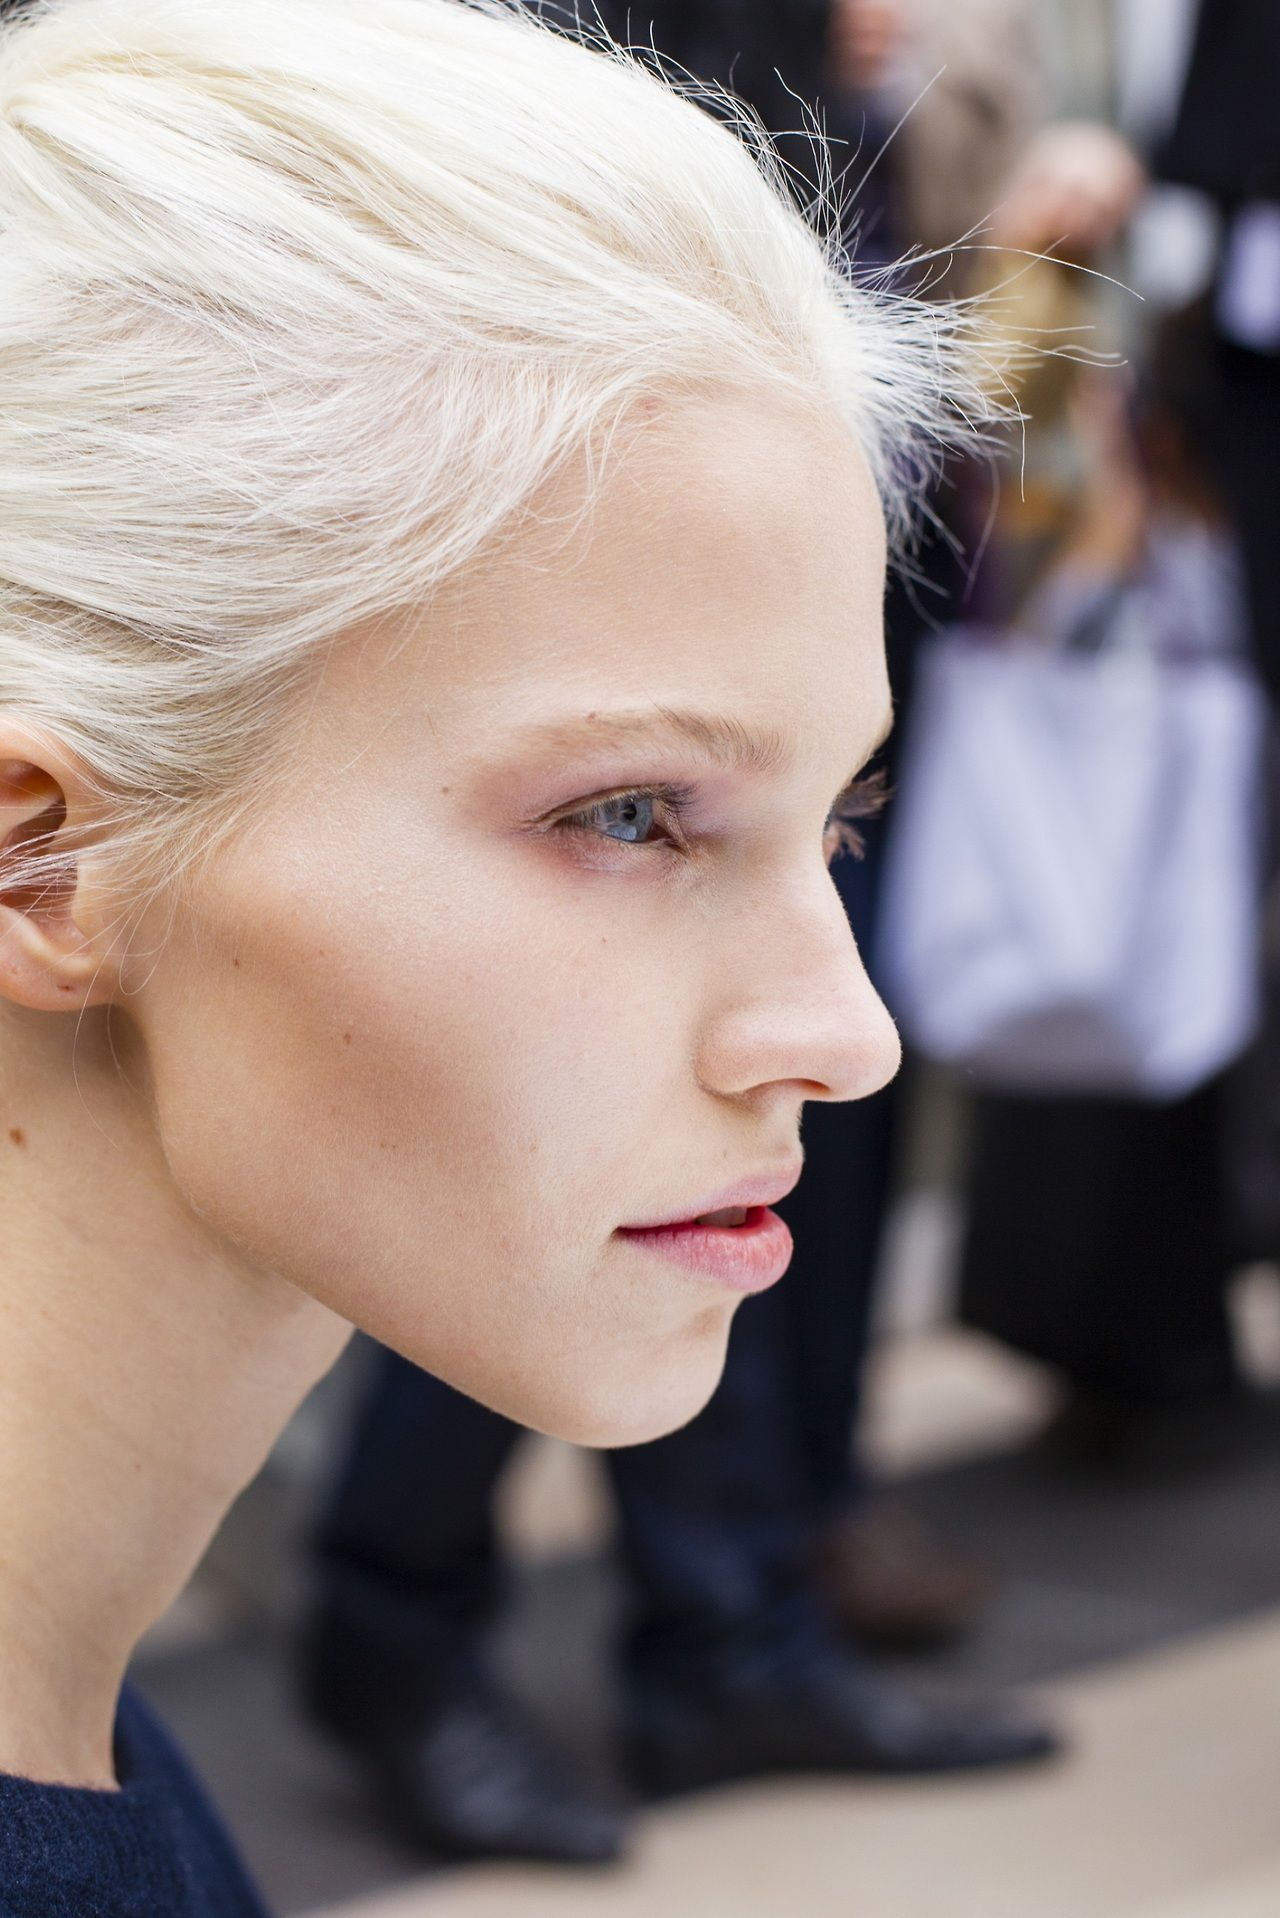 Sunkissed beauty face u body pinterest